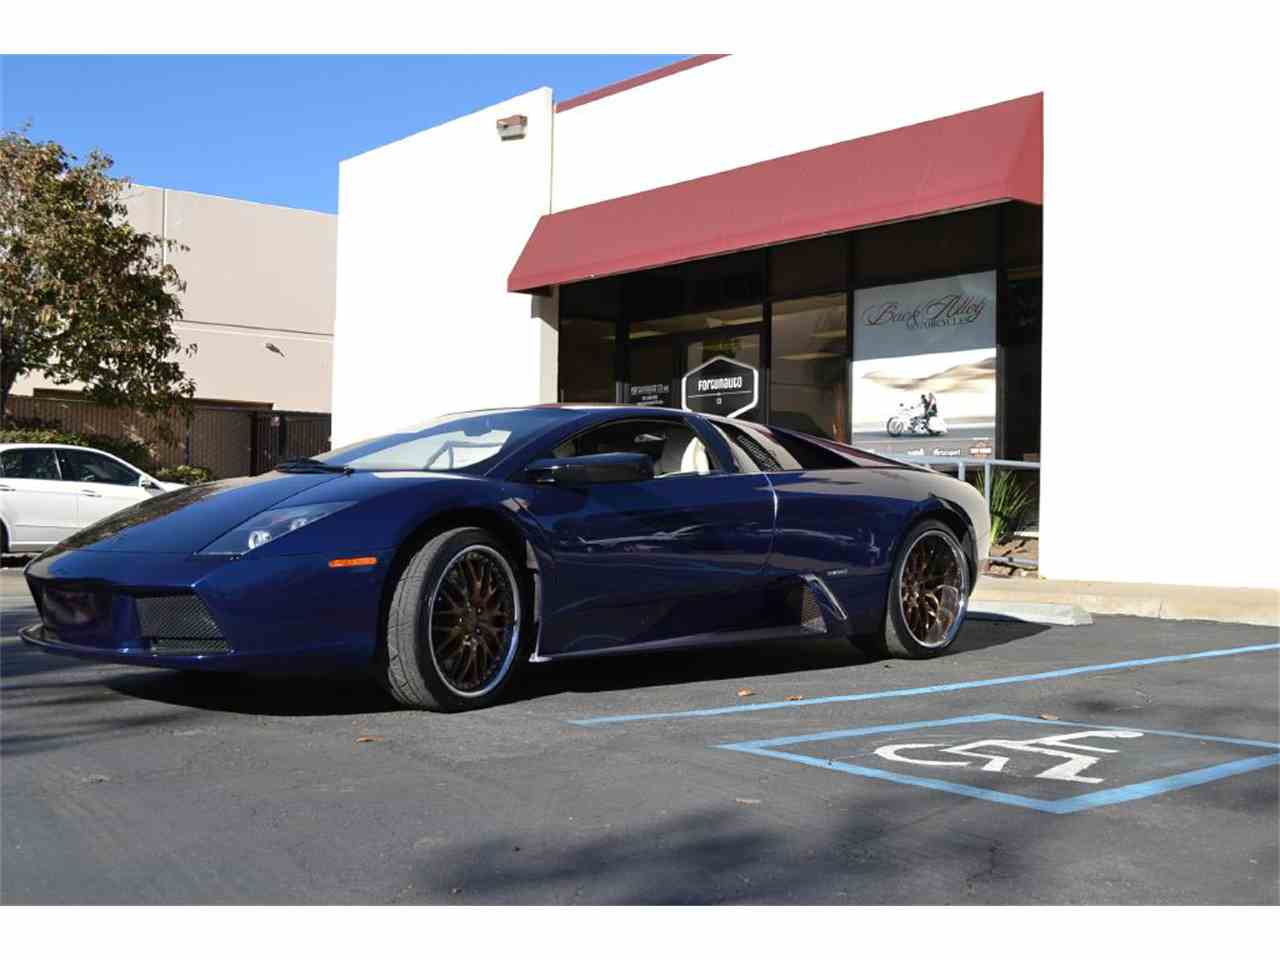 Large Picture of 2004 Lamborghini Murcielago located in California - $110,000.00 - LVJ1